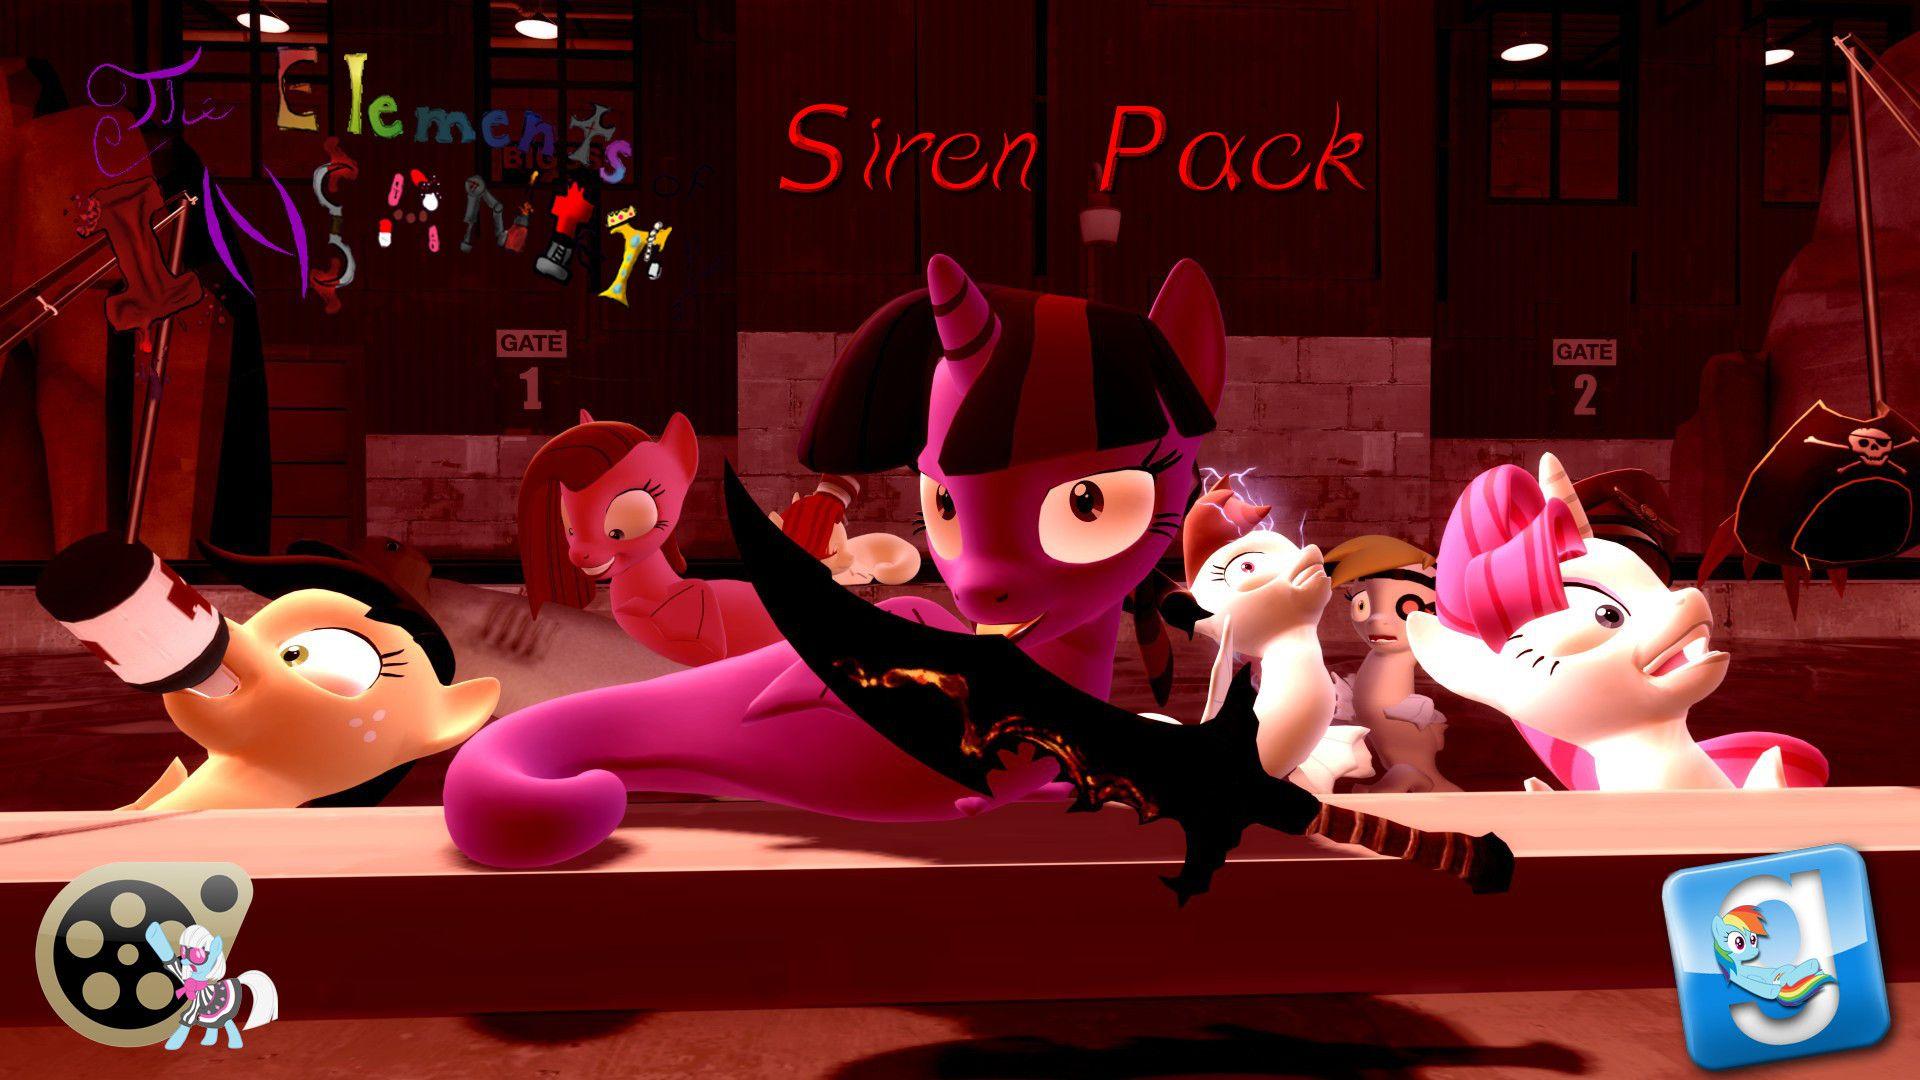 Gmod Sfm Ponies Eoi Siren Pack Dl Tyraka628 - Year of Clean Water